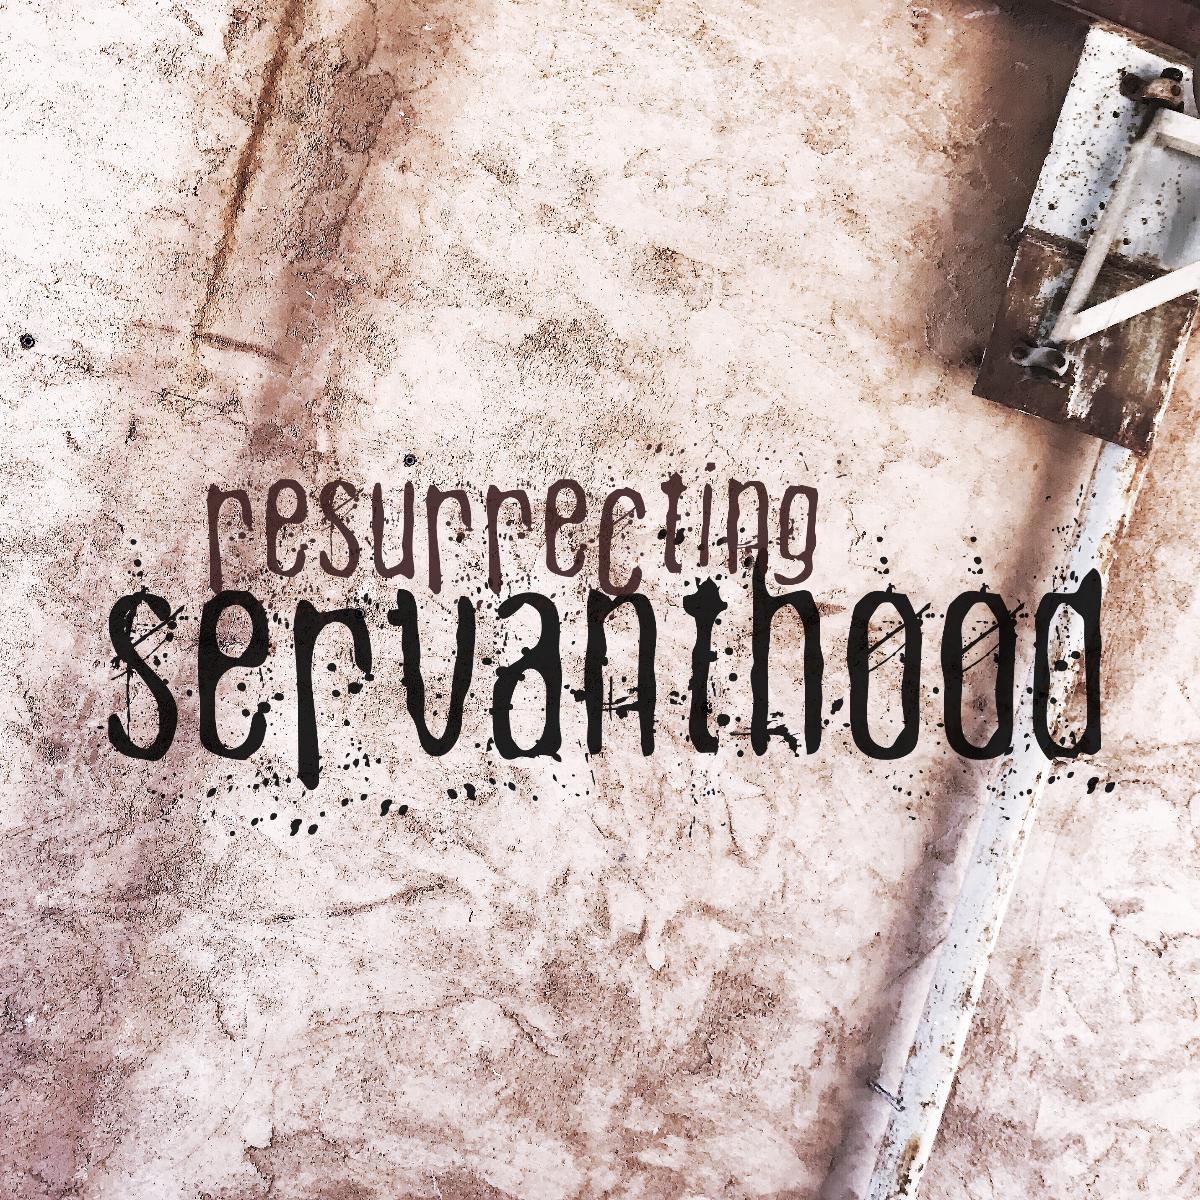 Resurrecting Servanthood